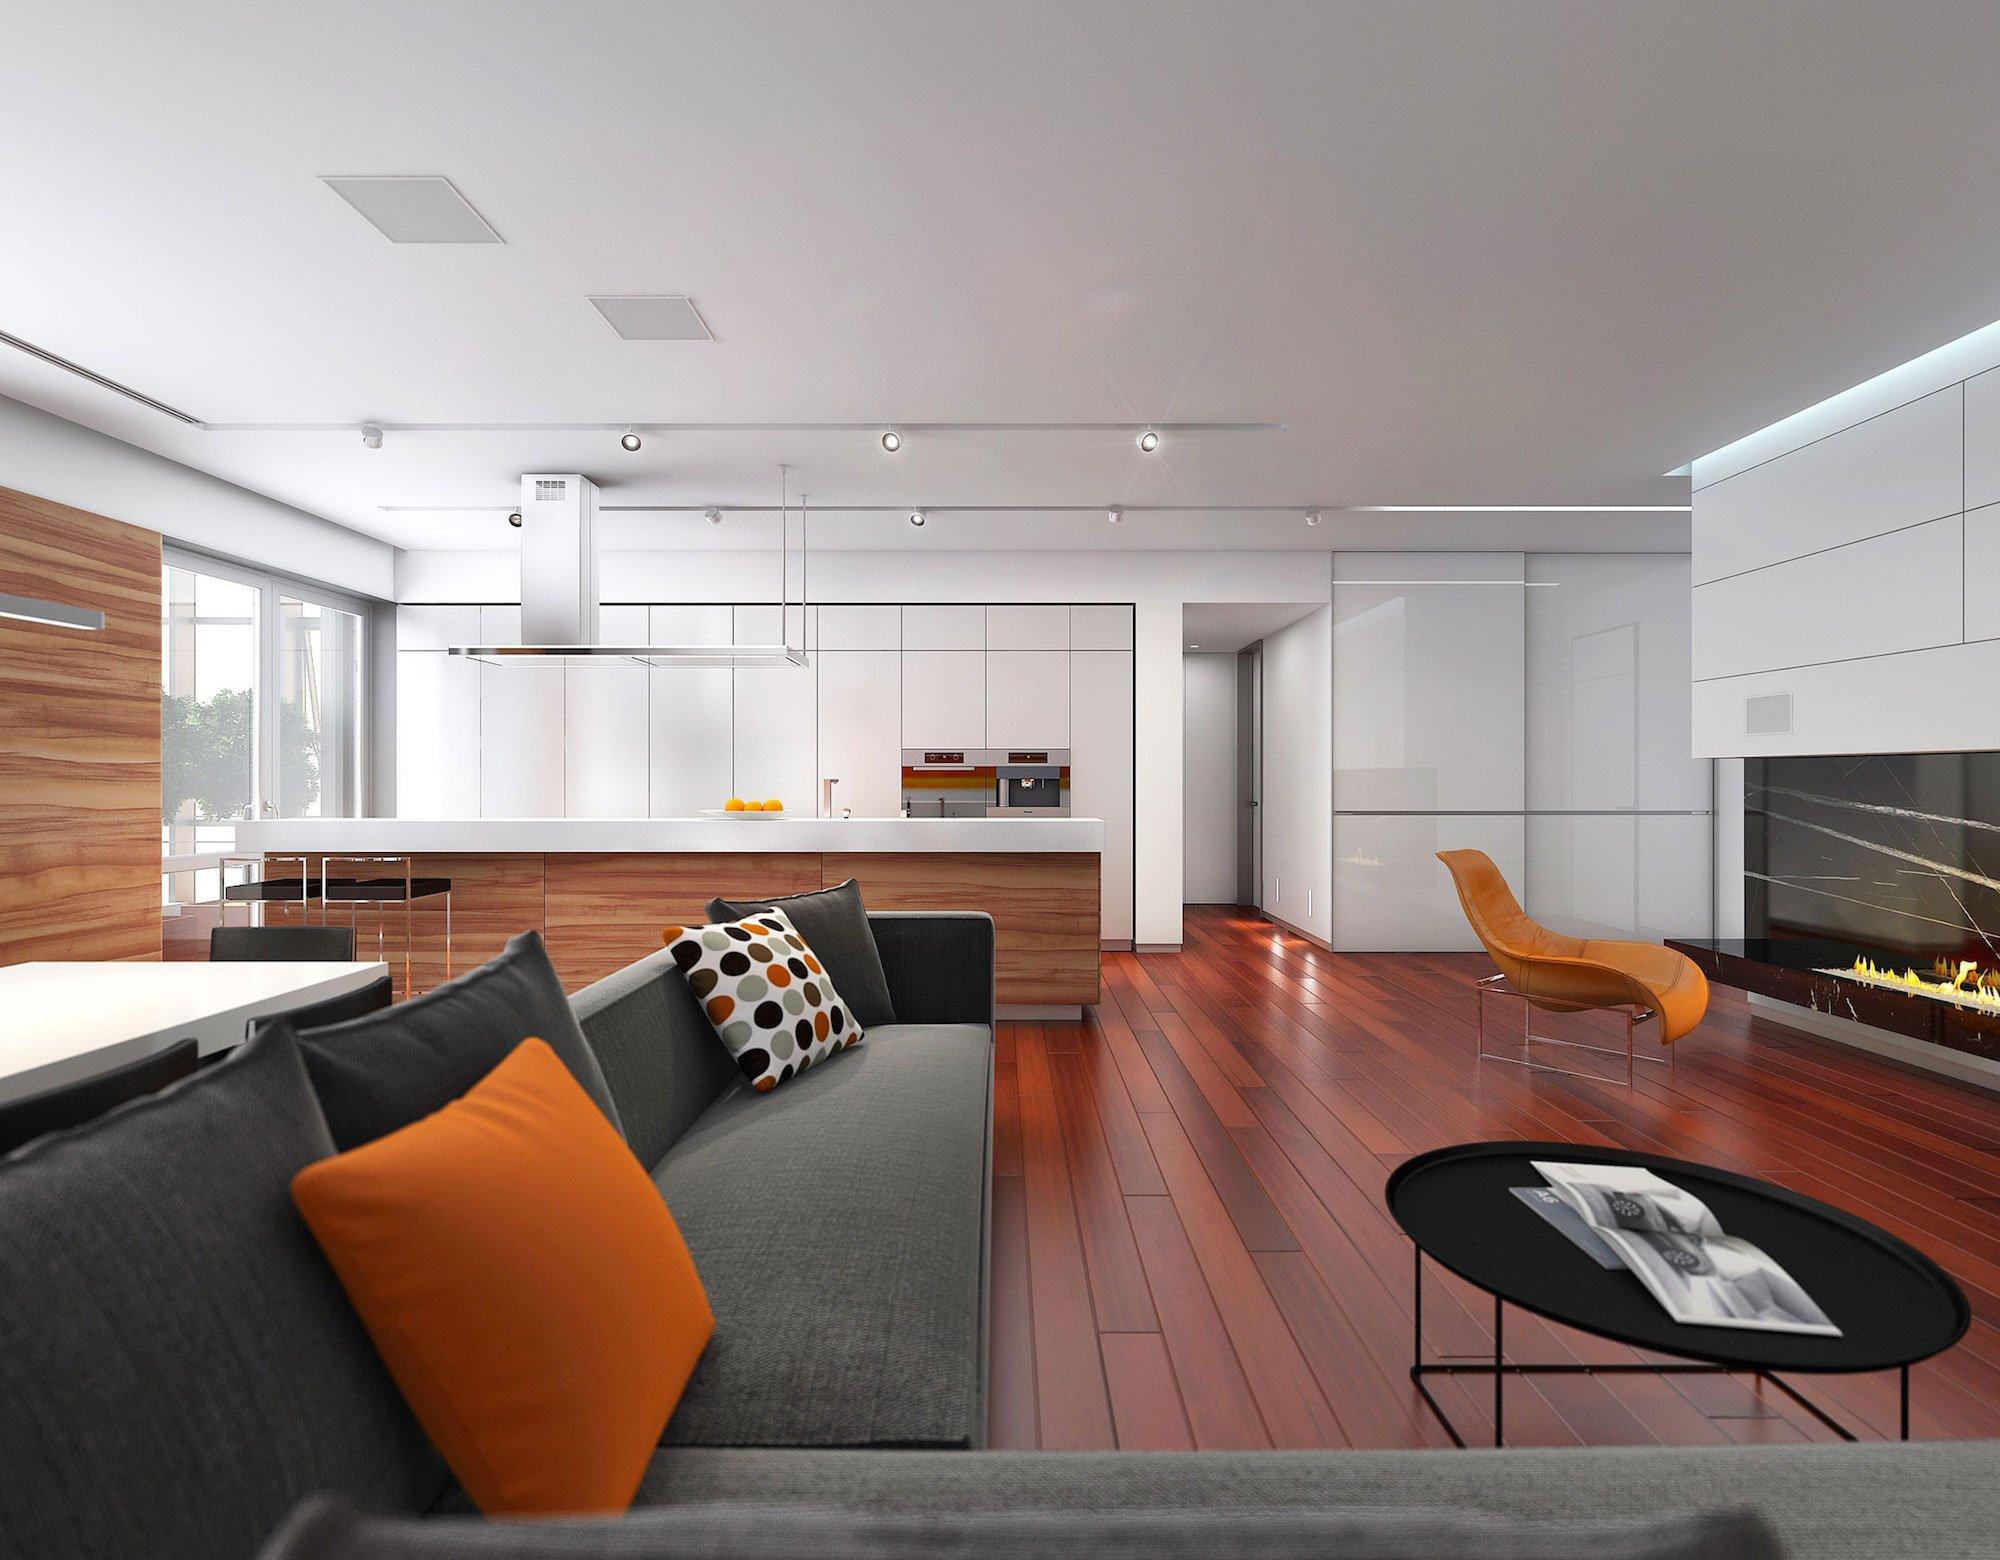 Plano de departamento de tres dormitorios for Diseno para cocina comedor